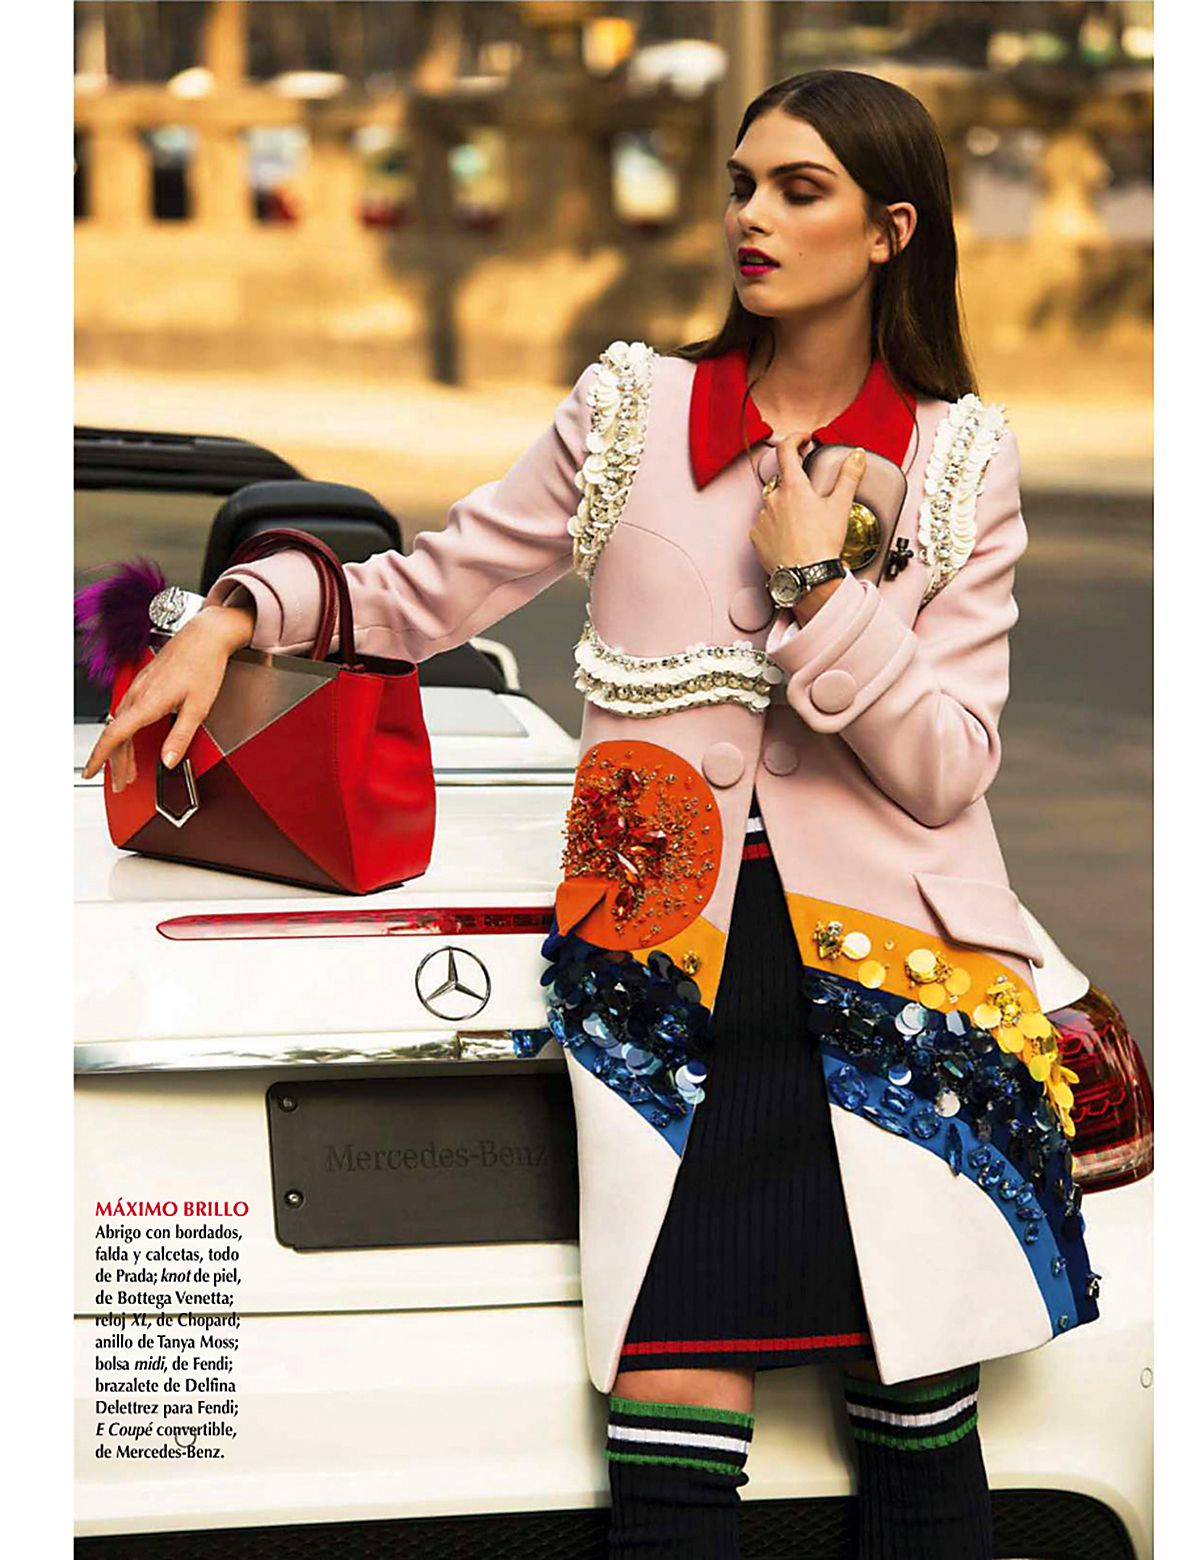 visual optimism; fashion editorials, shows, campaigns & more!: absoluta sofisticación: maria palm by alexander neumann for vogue mexico april 2014